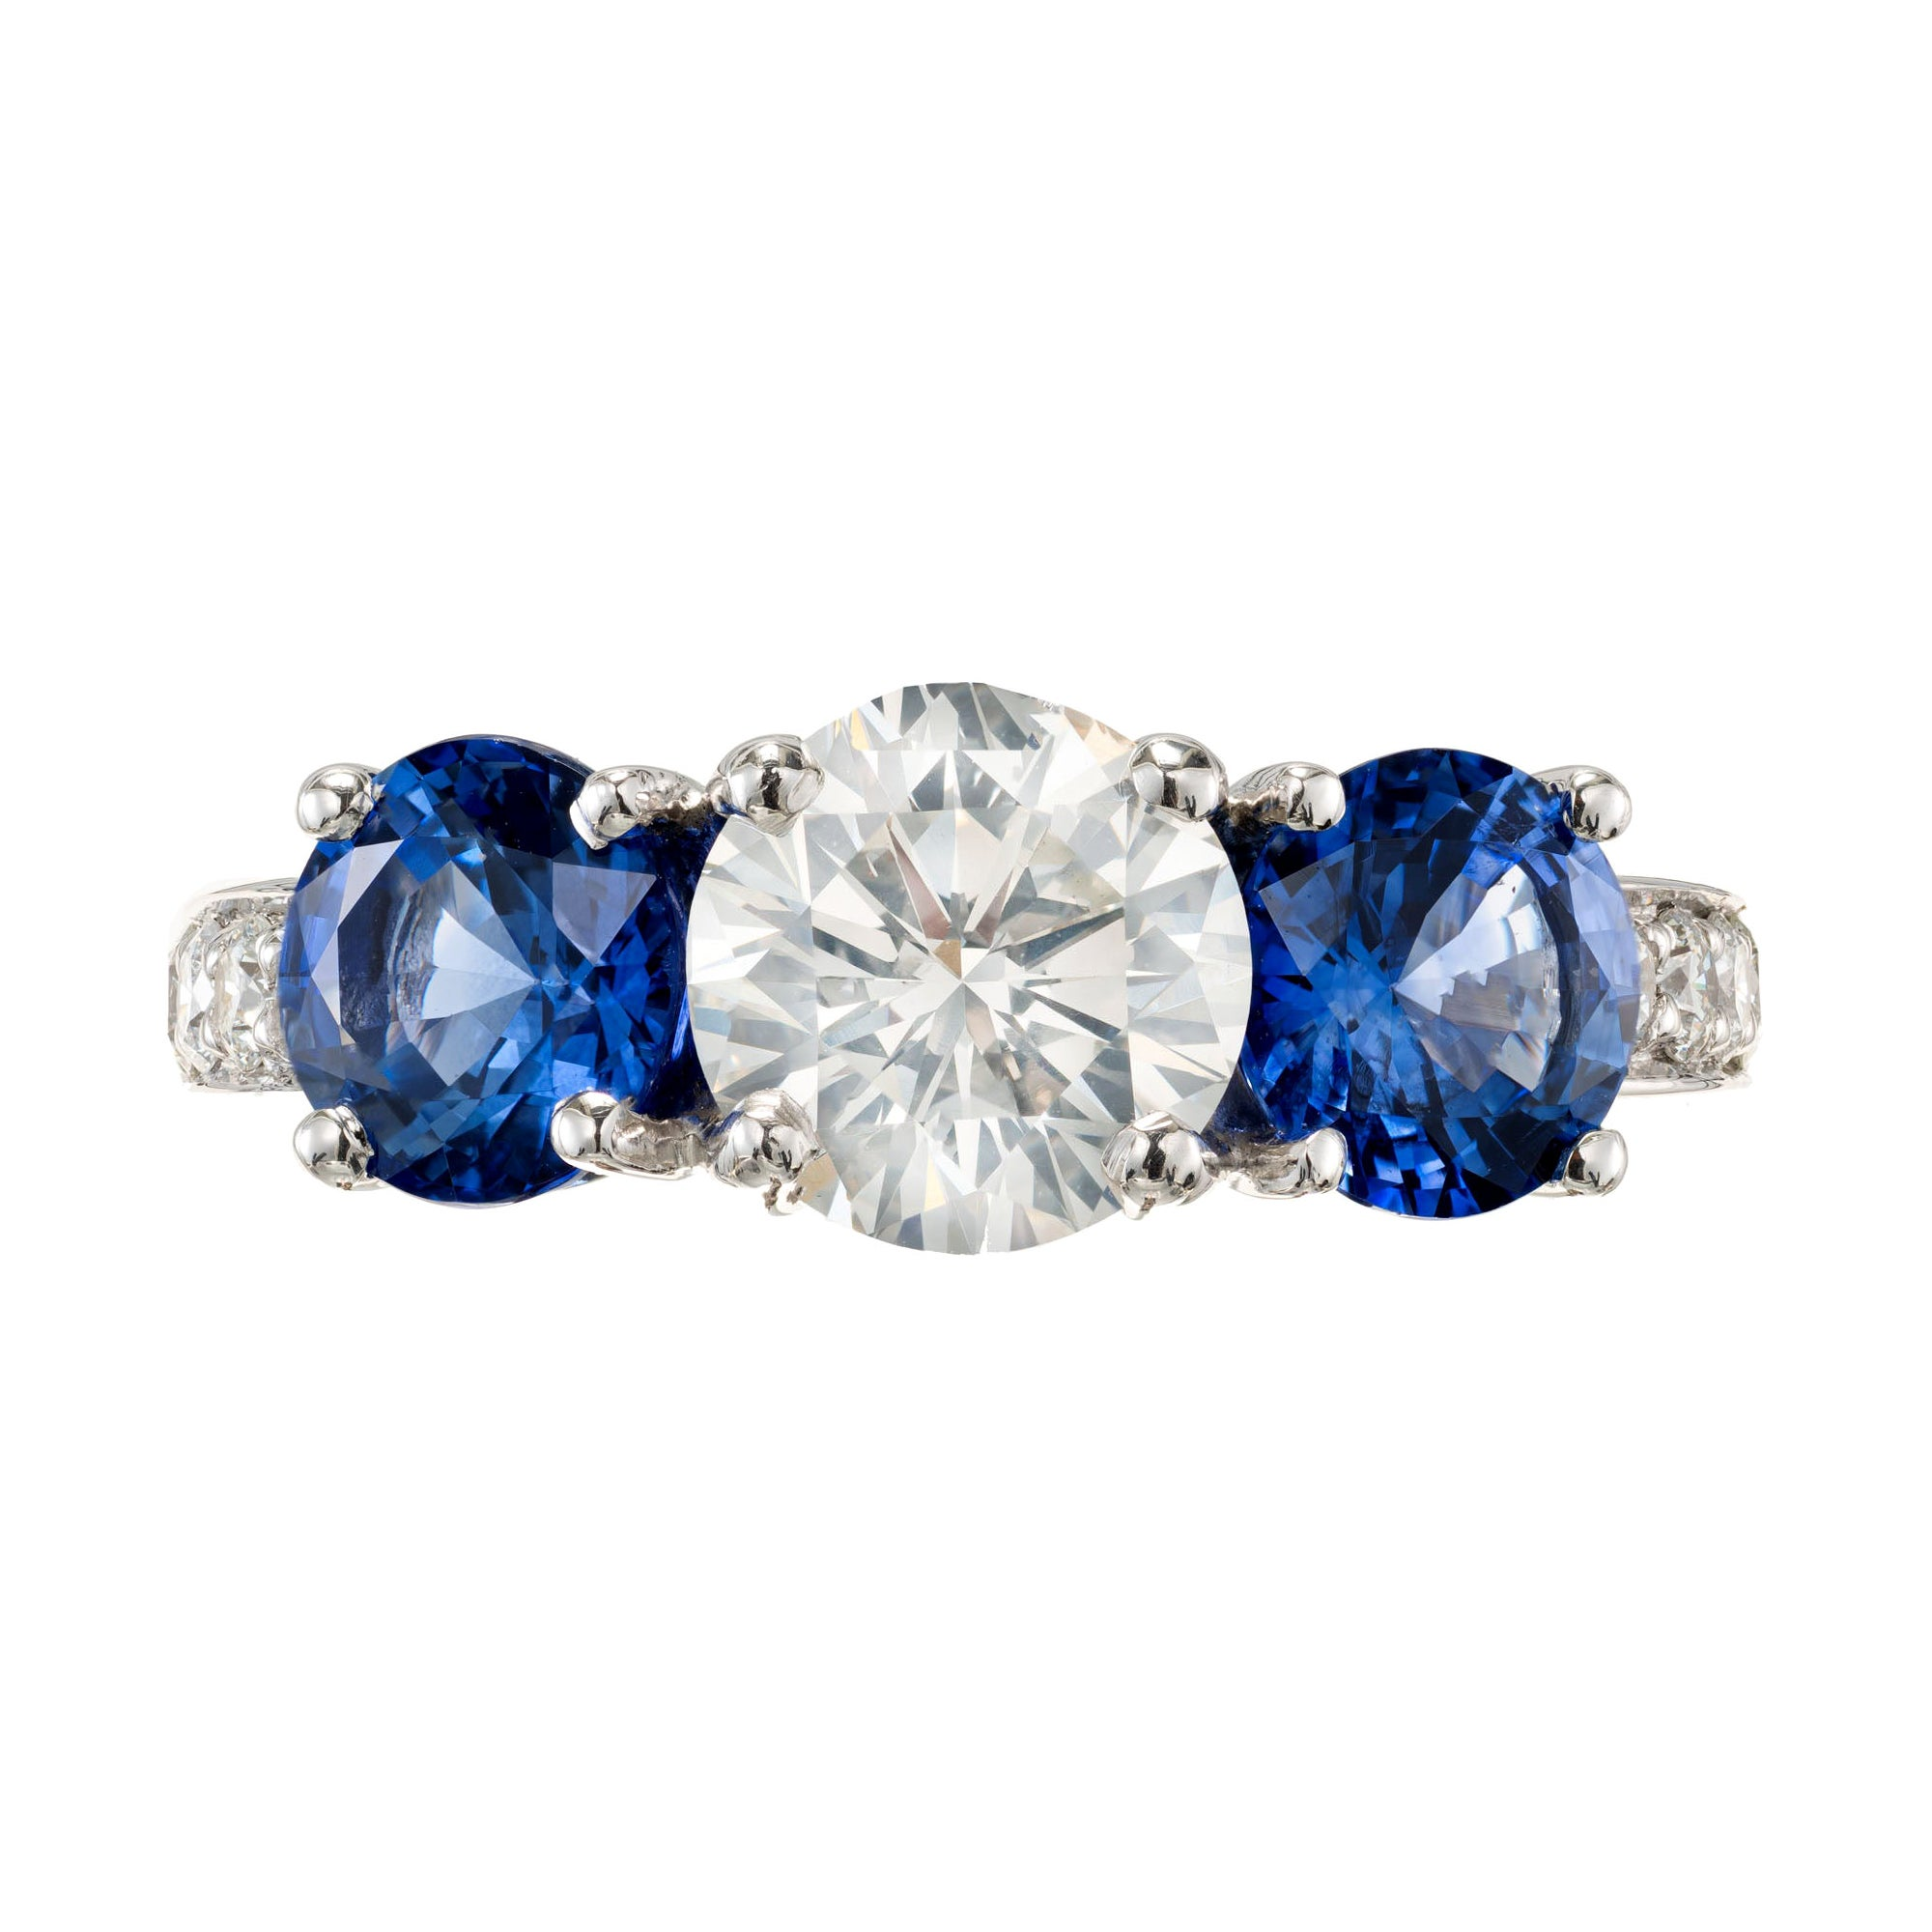 Peter Suchy GIA Certified 2.45 Carat Diamond Sapphire Platinum Engagement Ring